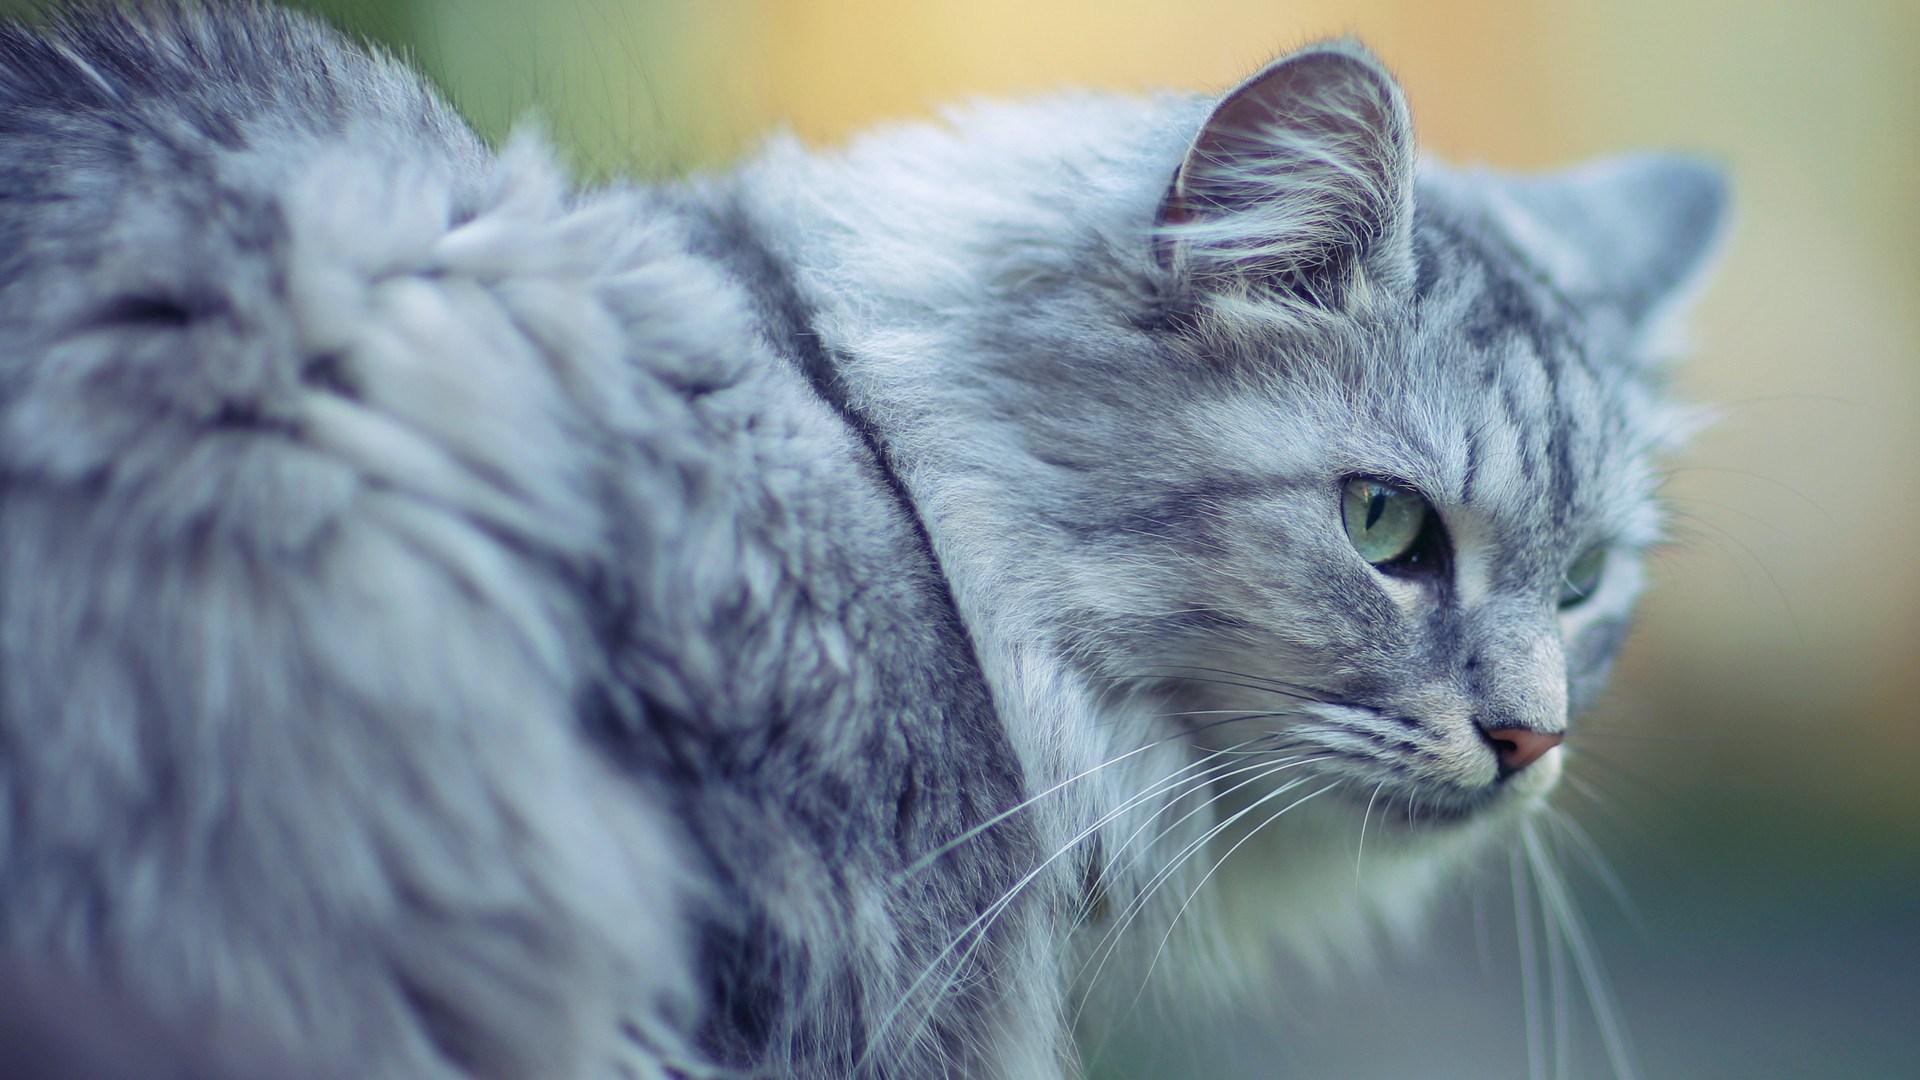 Beautiful Cat Close-Up Photo